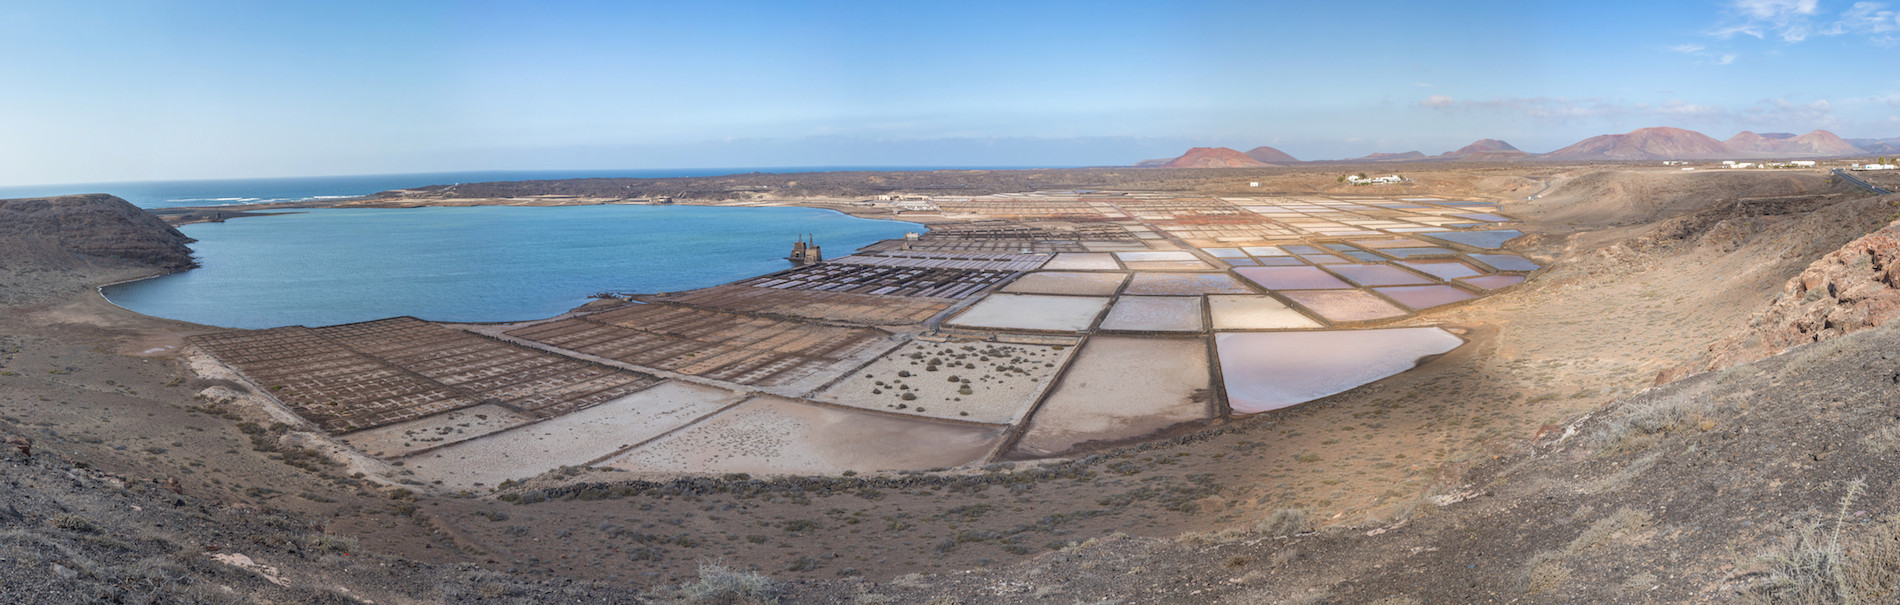 PHOTO Lanzarote marrais salant panoramique